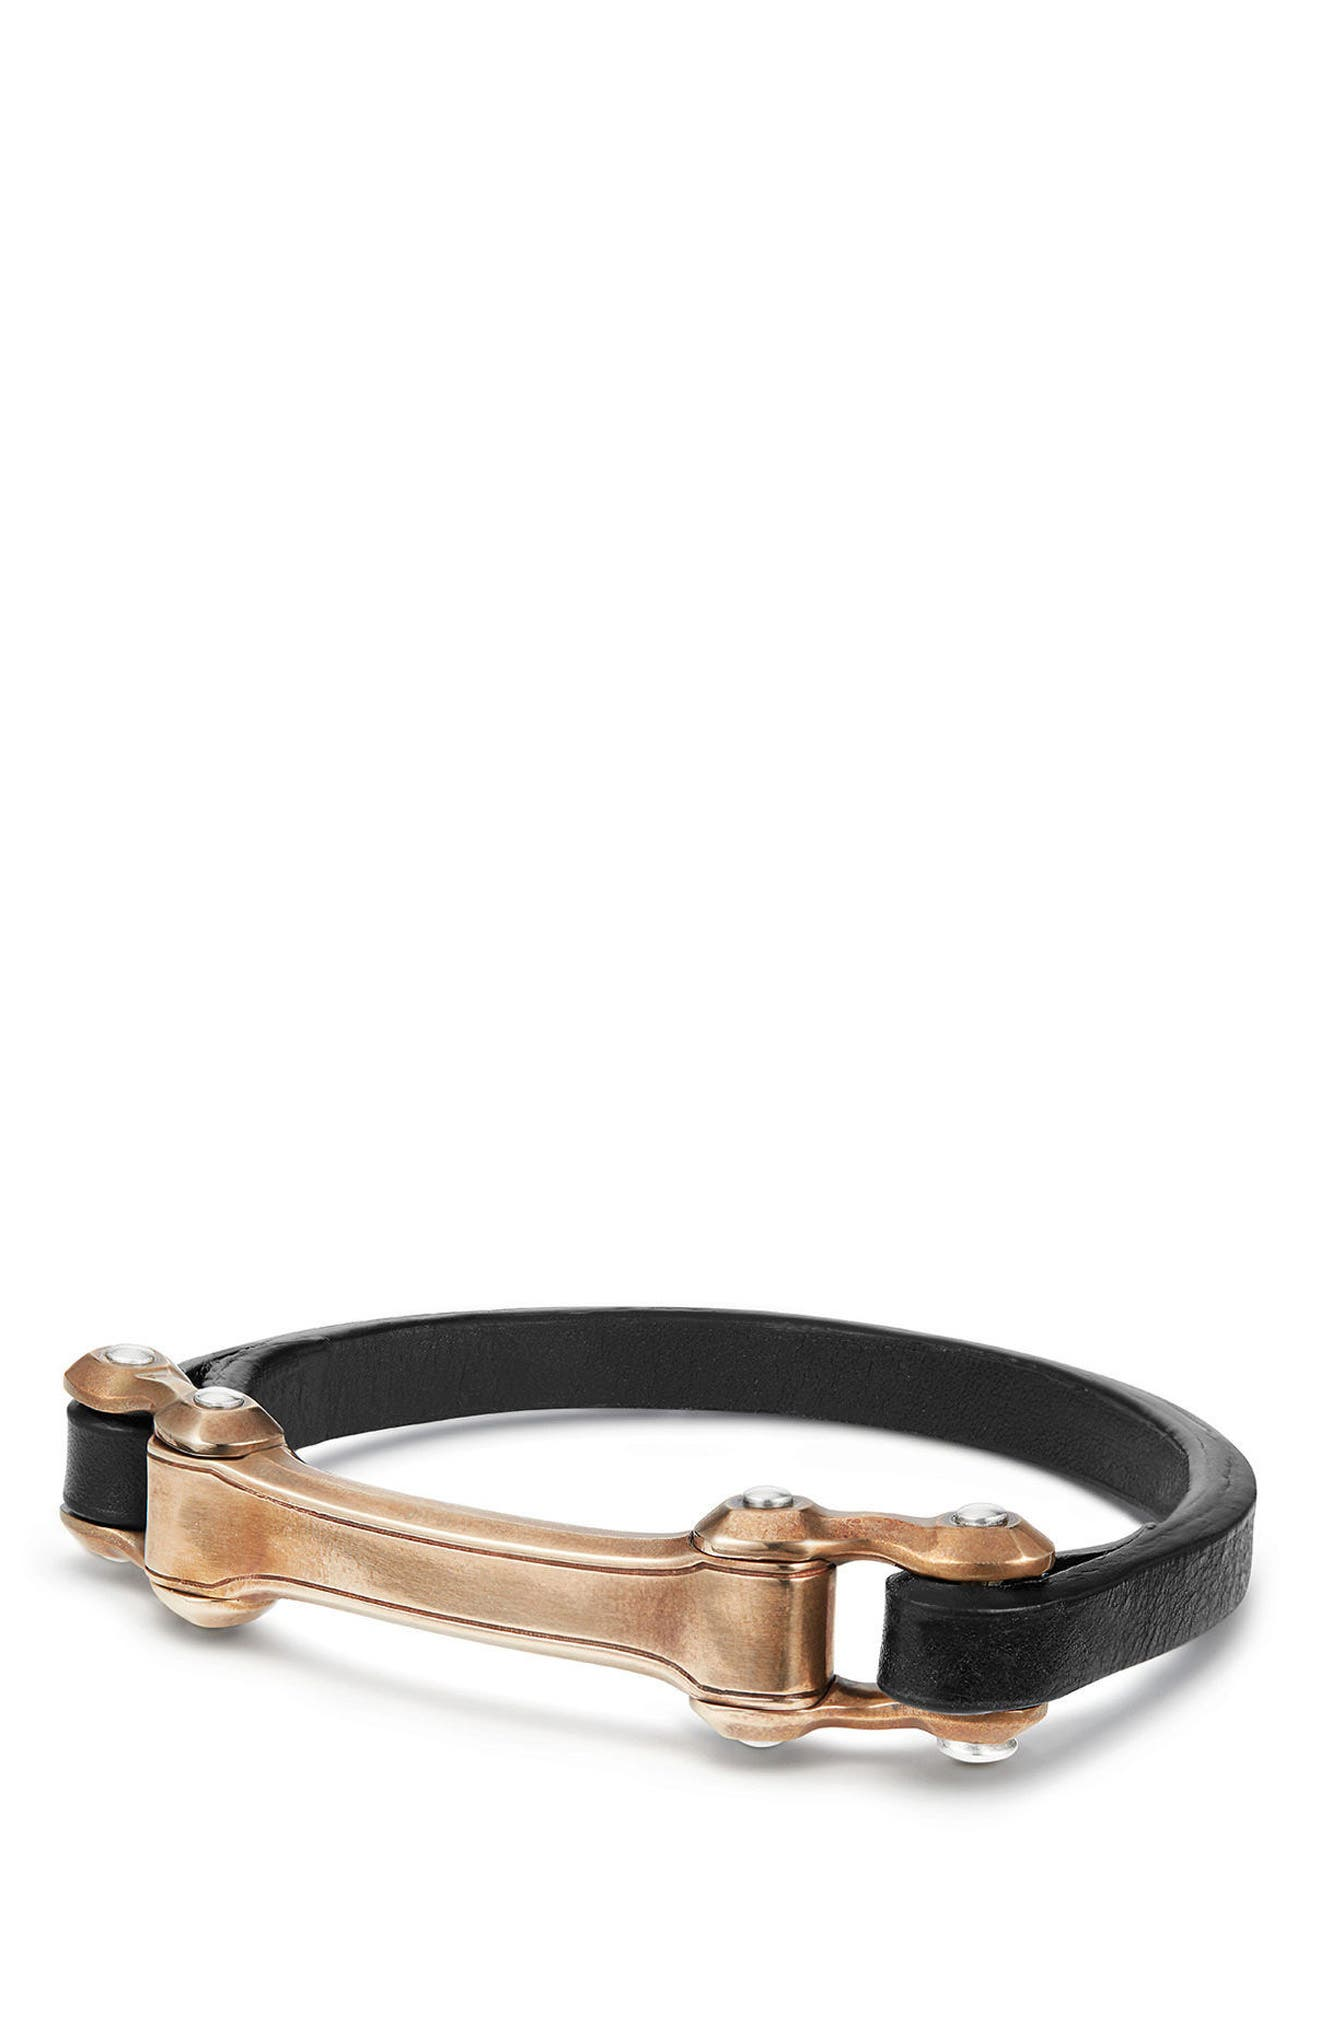 DAVID YURMAN Anvil ID Bracelet